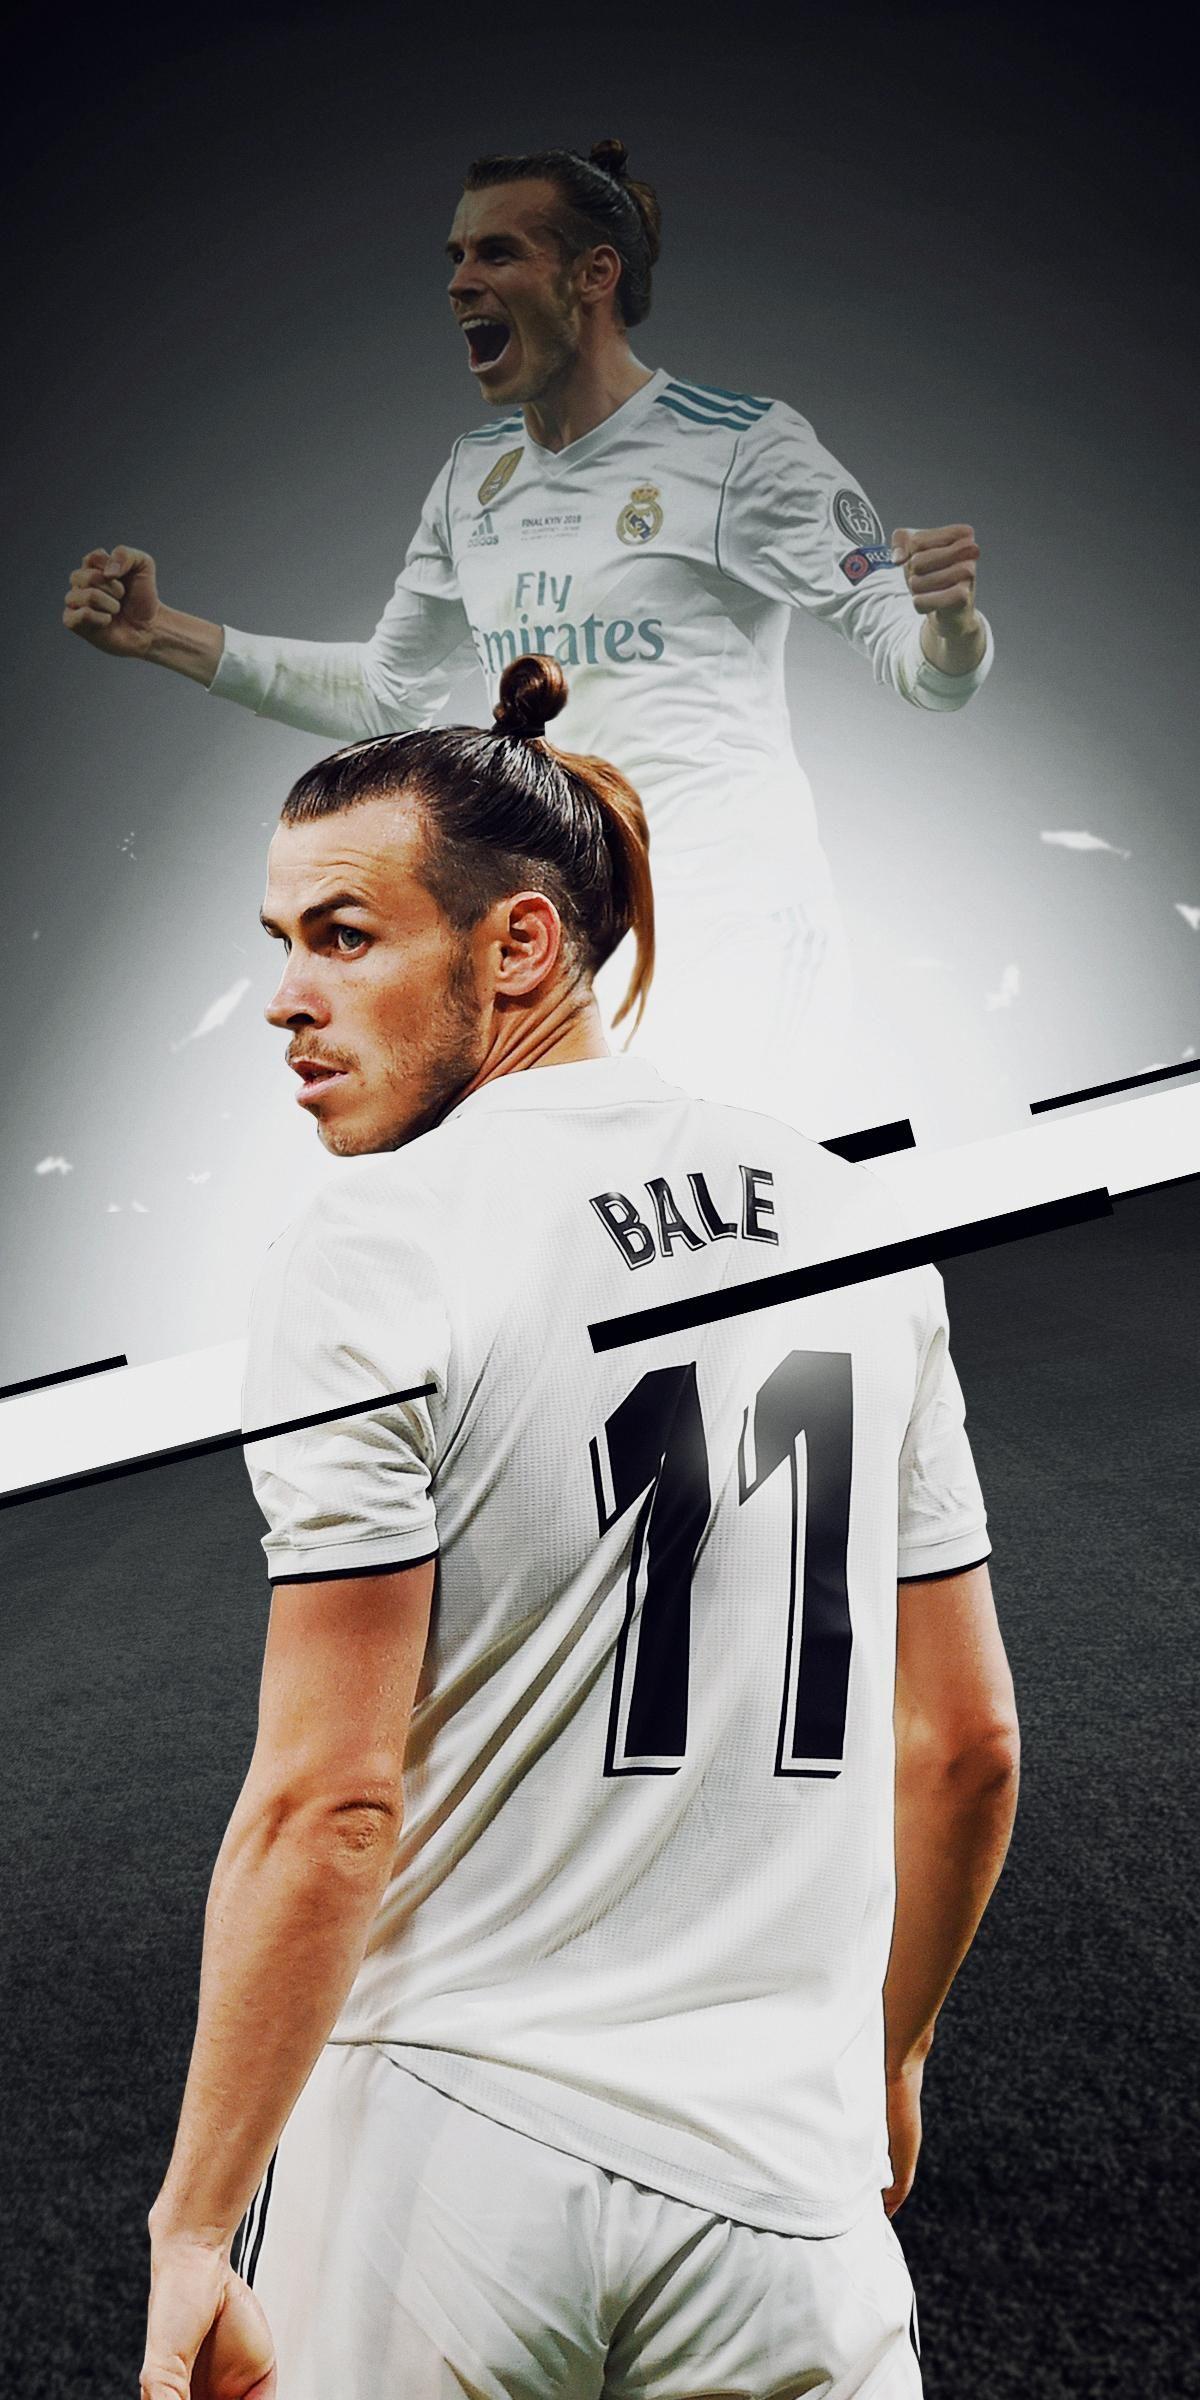 Gareth Bale Wallpaper Gareth Bale Real Madrid Gareth Bale Real Madrid Wallpapers